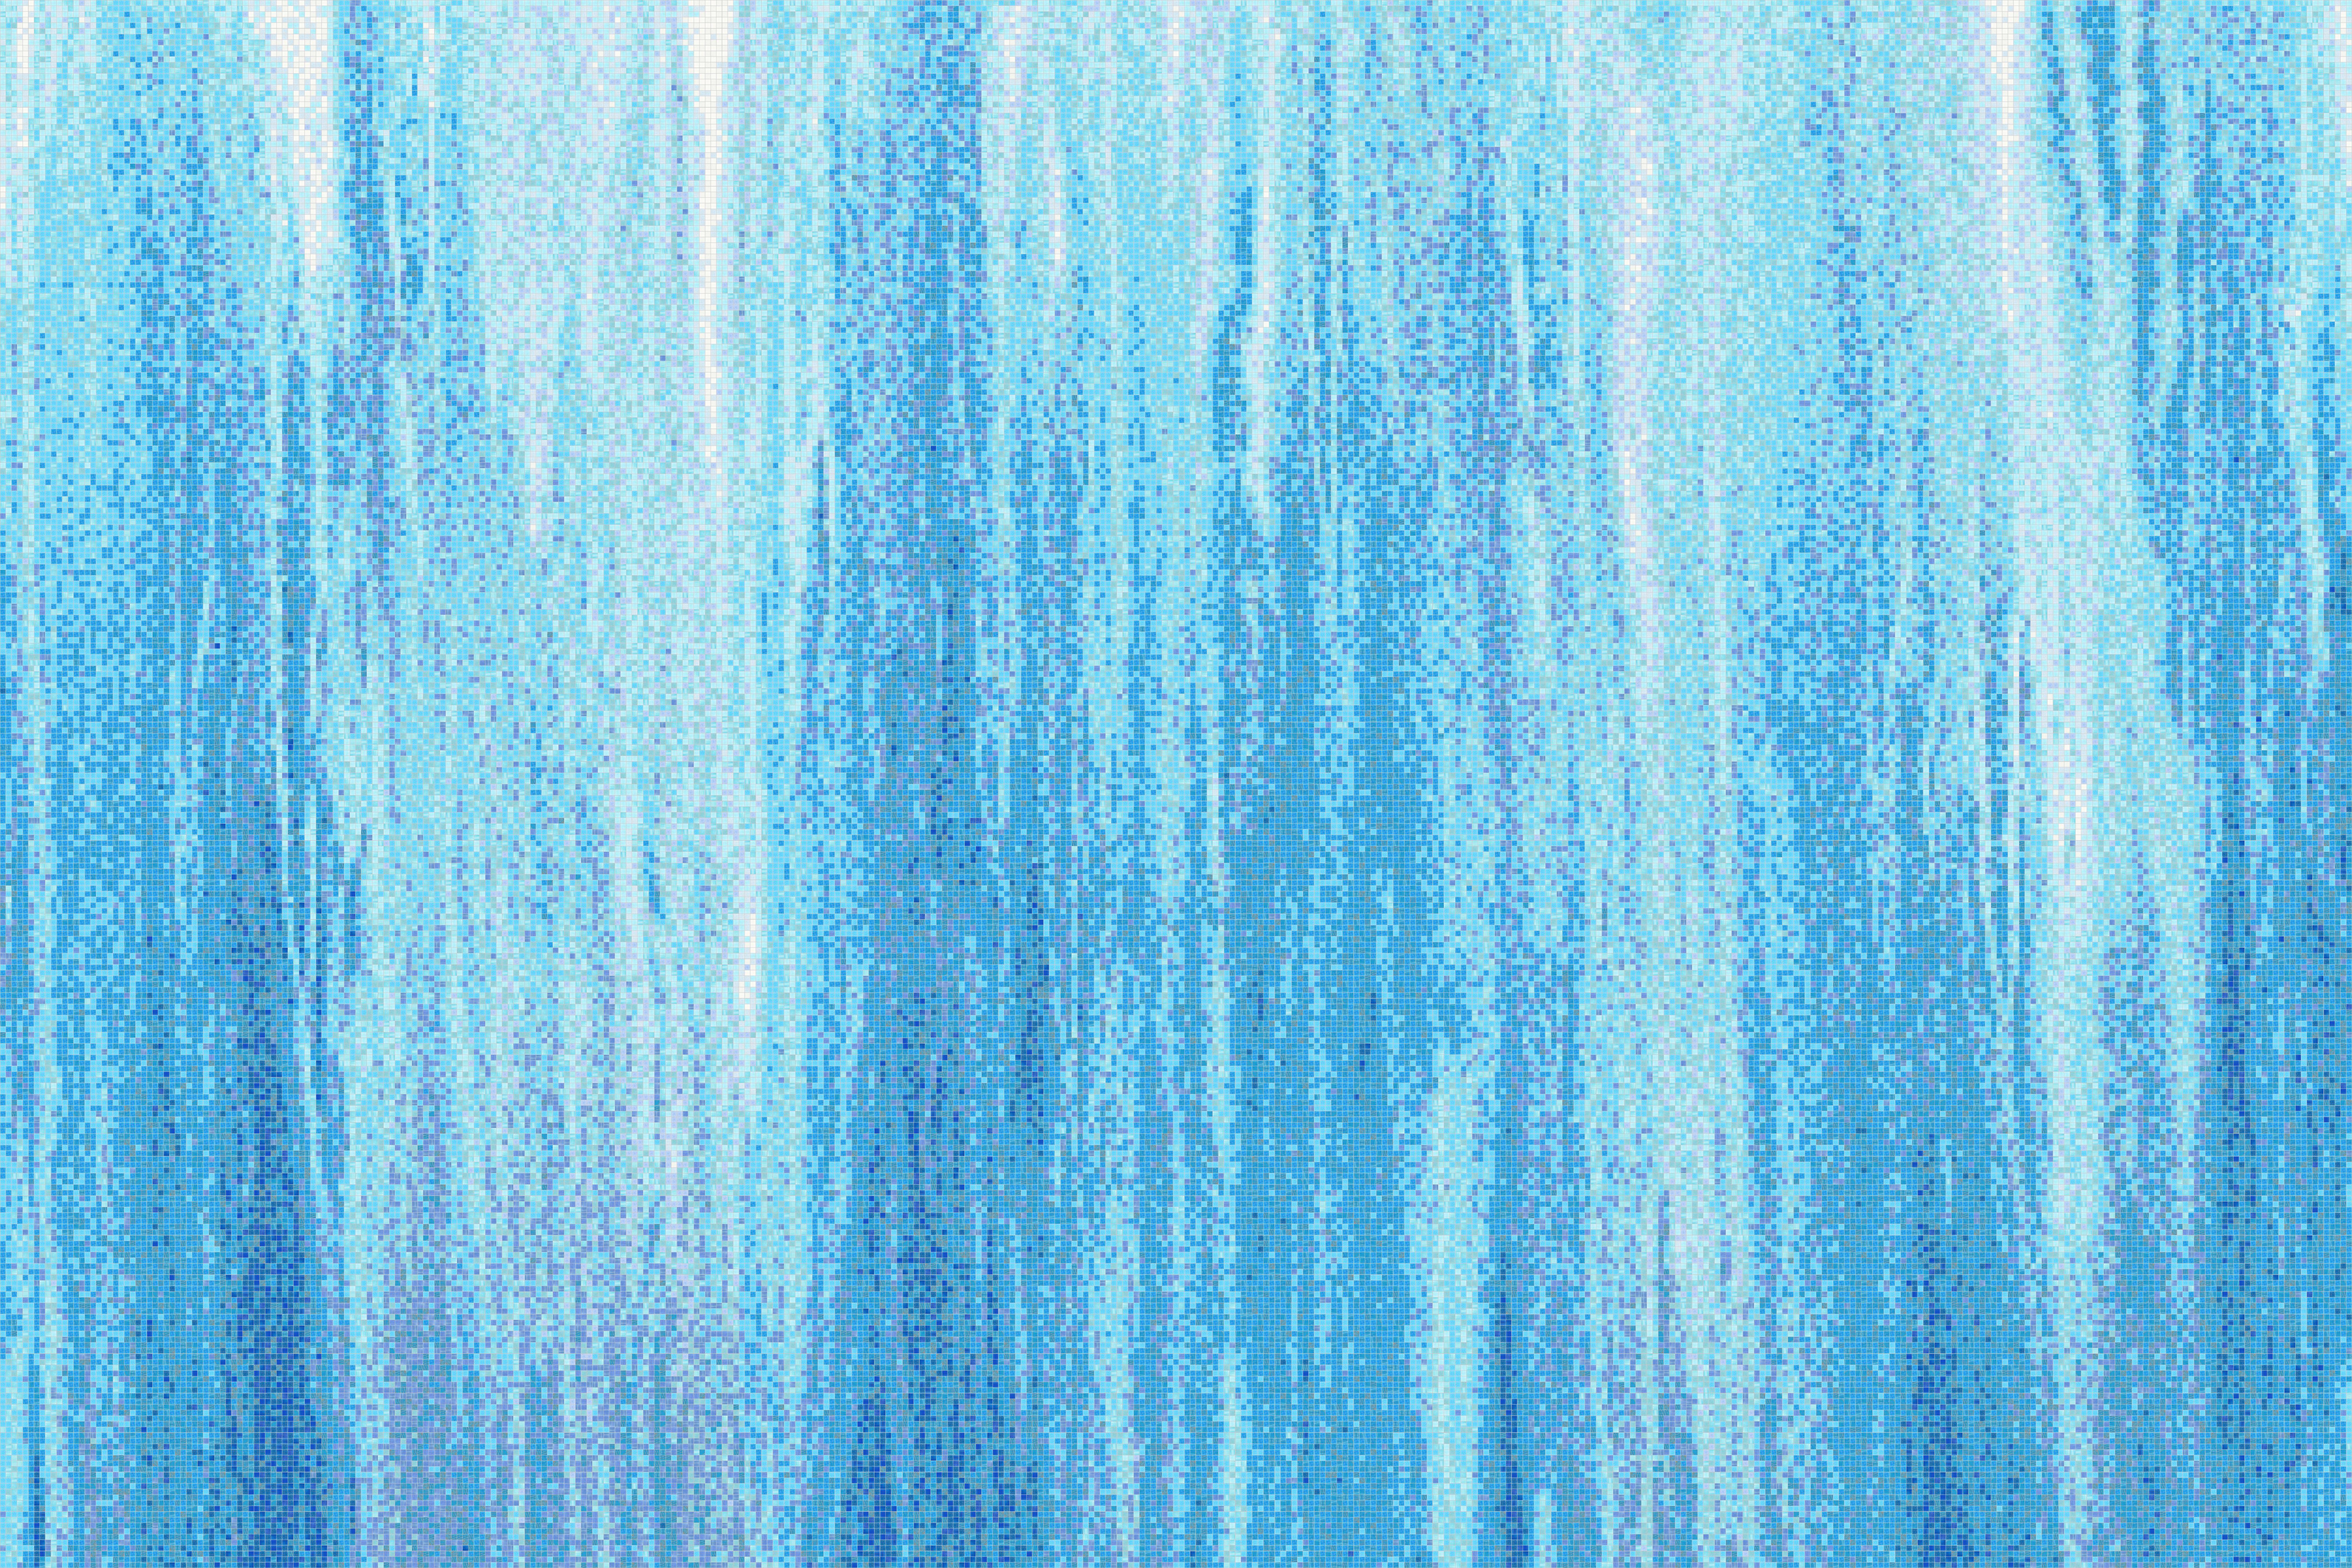 Blue water Tile Pattern   Waterlow Lake by ARTAIC